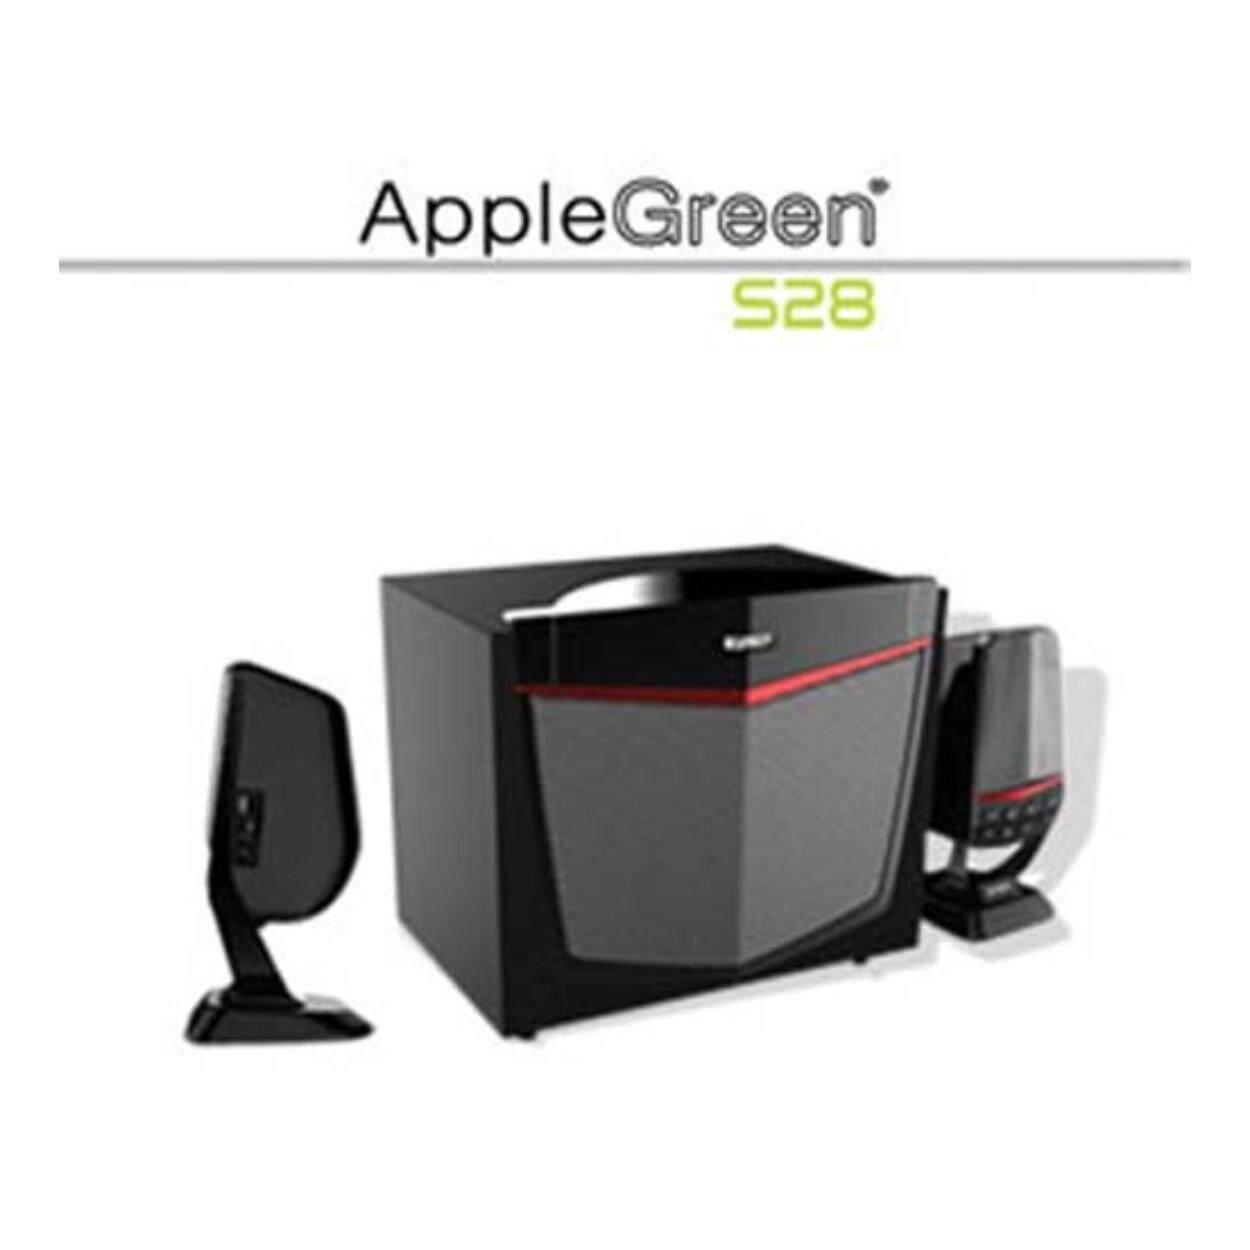 Applegreen S28 120W 2.1CH Subwoofer Speaker (Bluetooth/USB/SD/FM) iPhone iPad Samsung Vivo Oppo Xiaomi Redmi